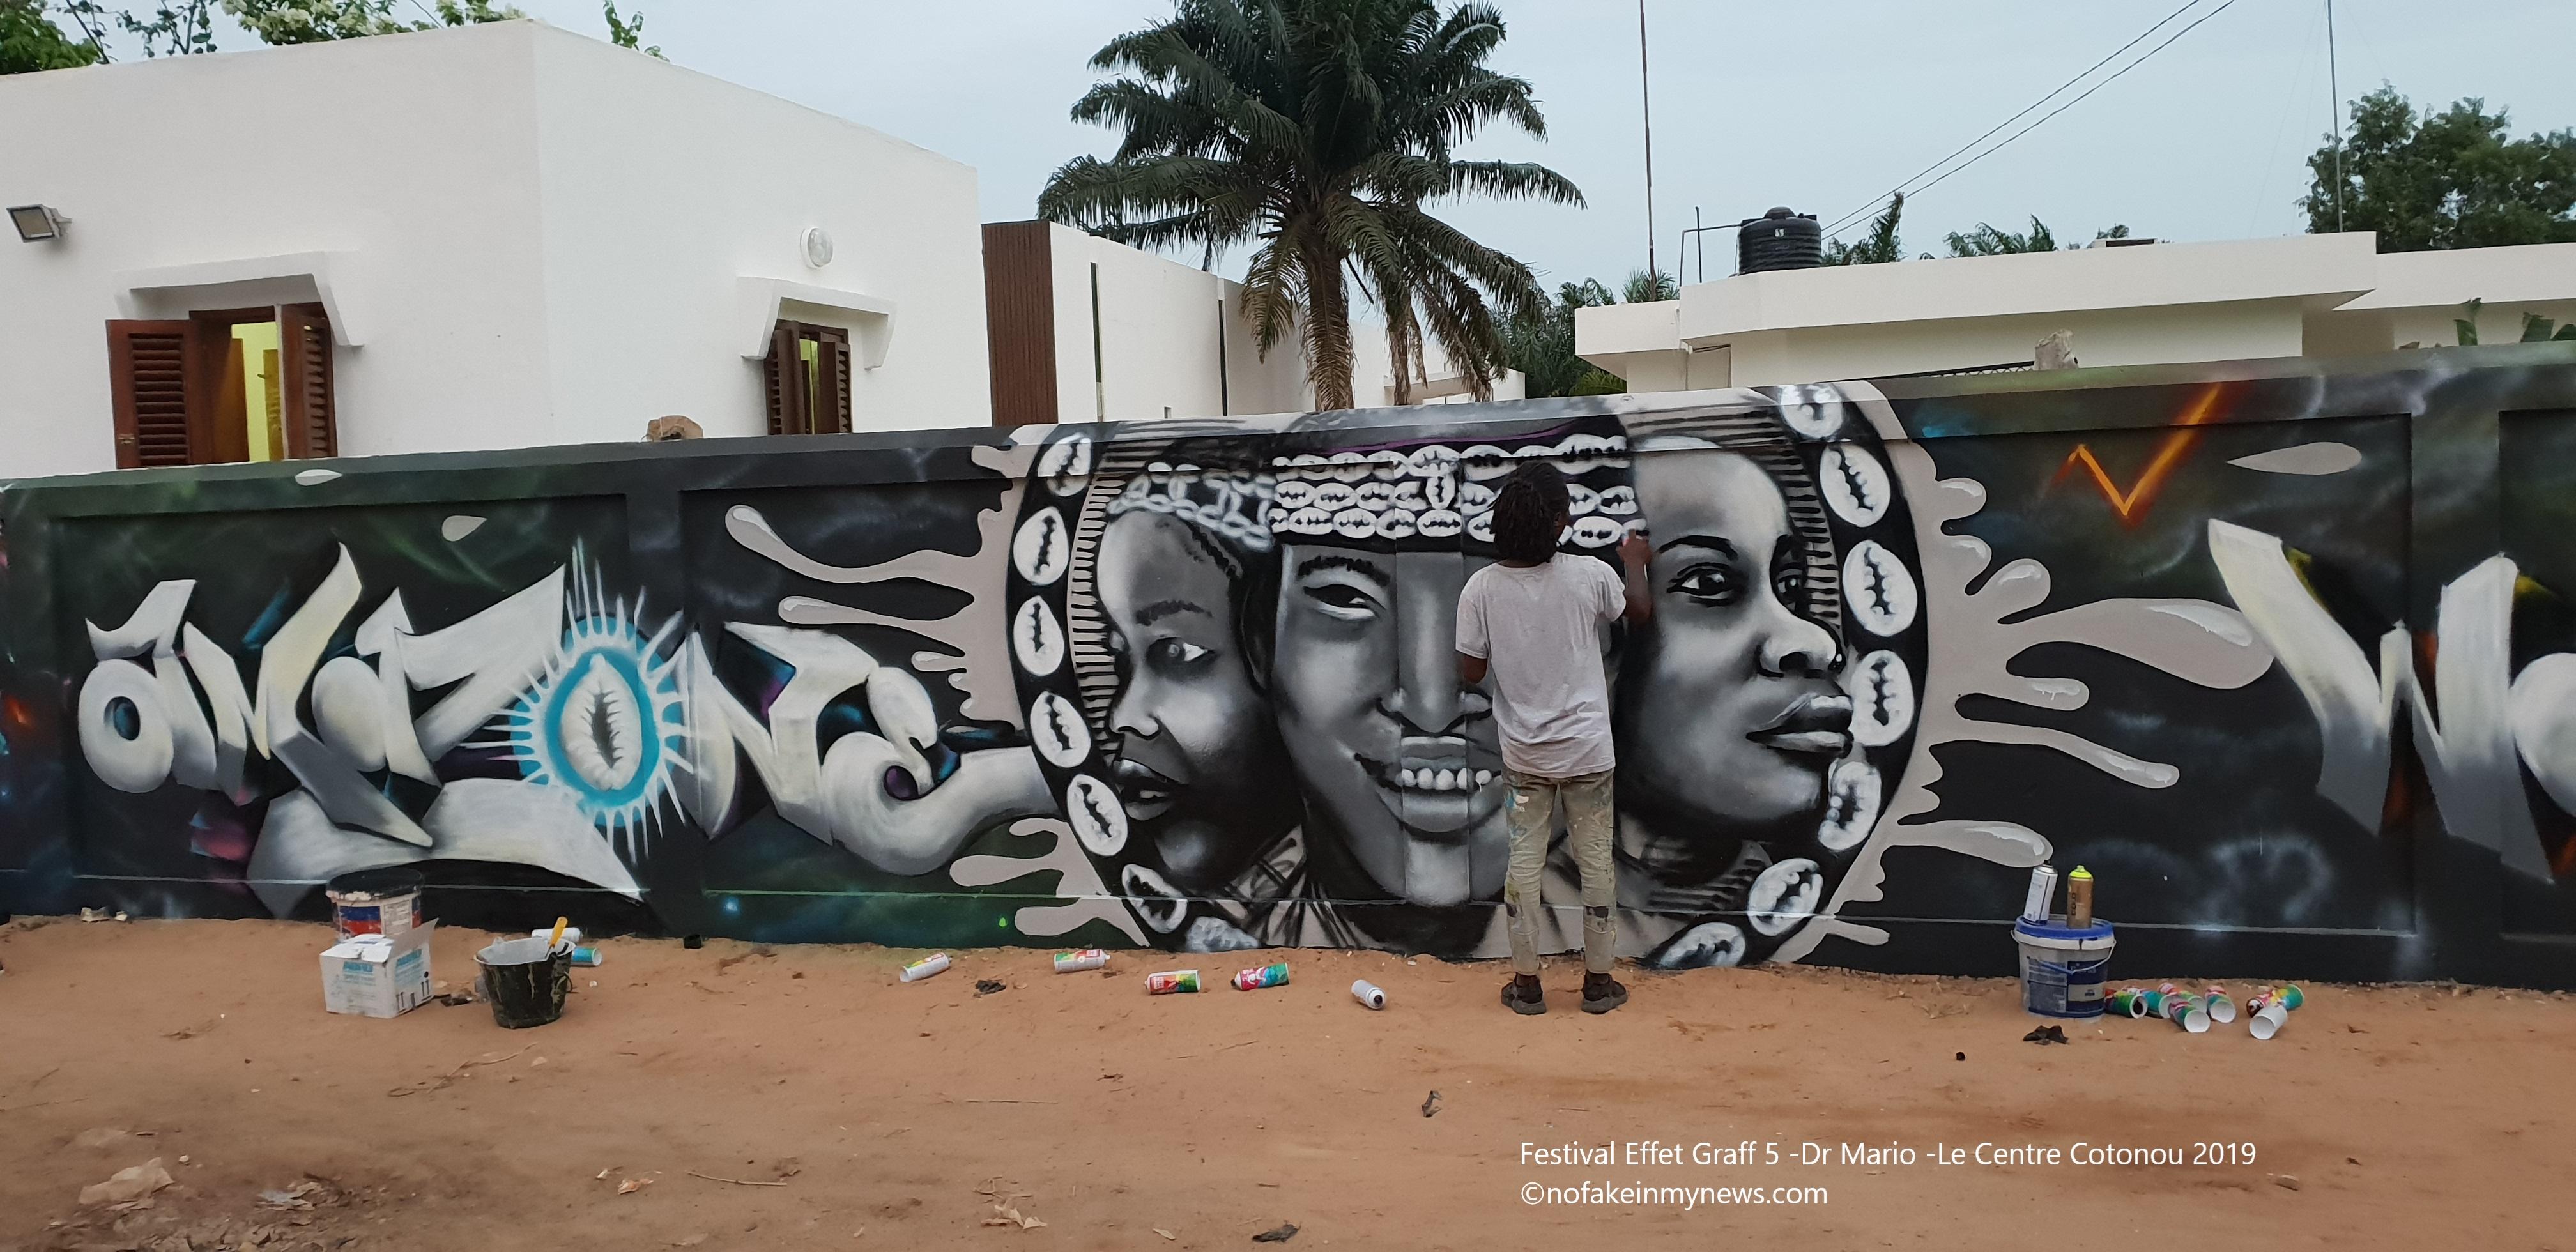 Festival Effet Graff 5 -Dr Mario -Le Centre Cotonou 2019 - ©nofakeinmynews